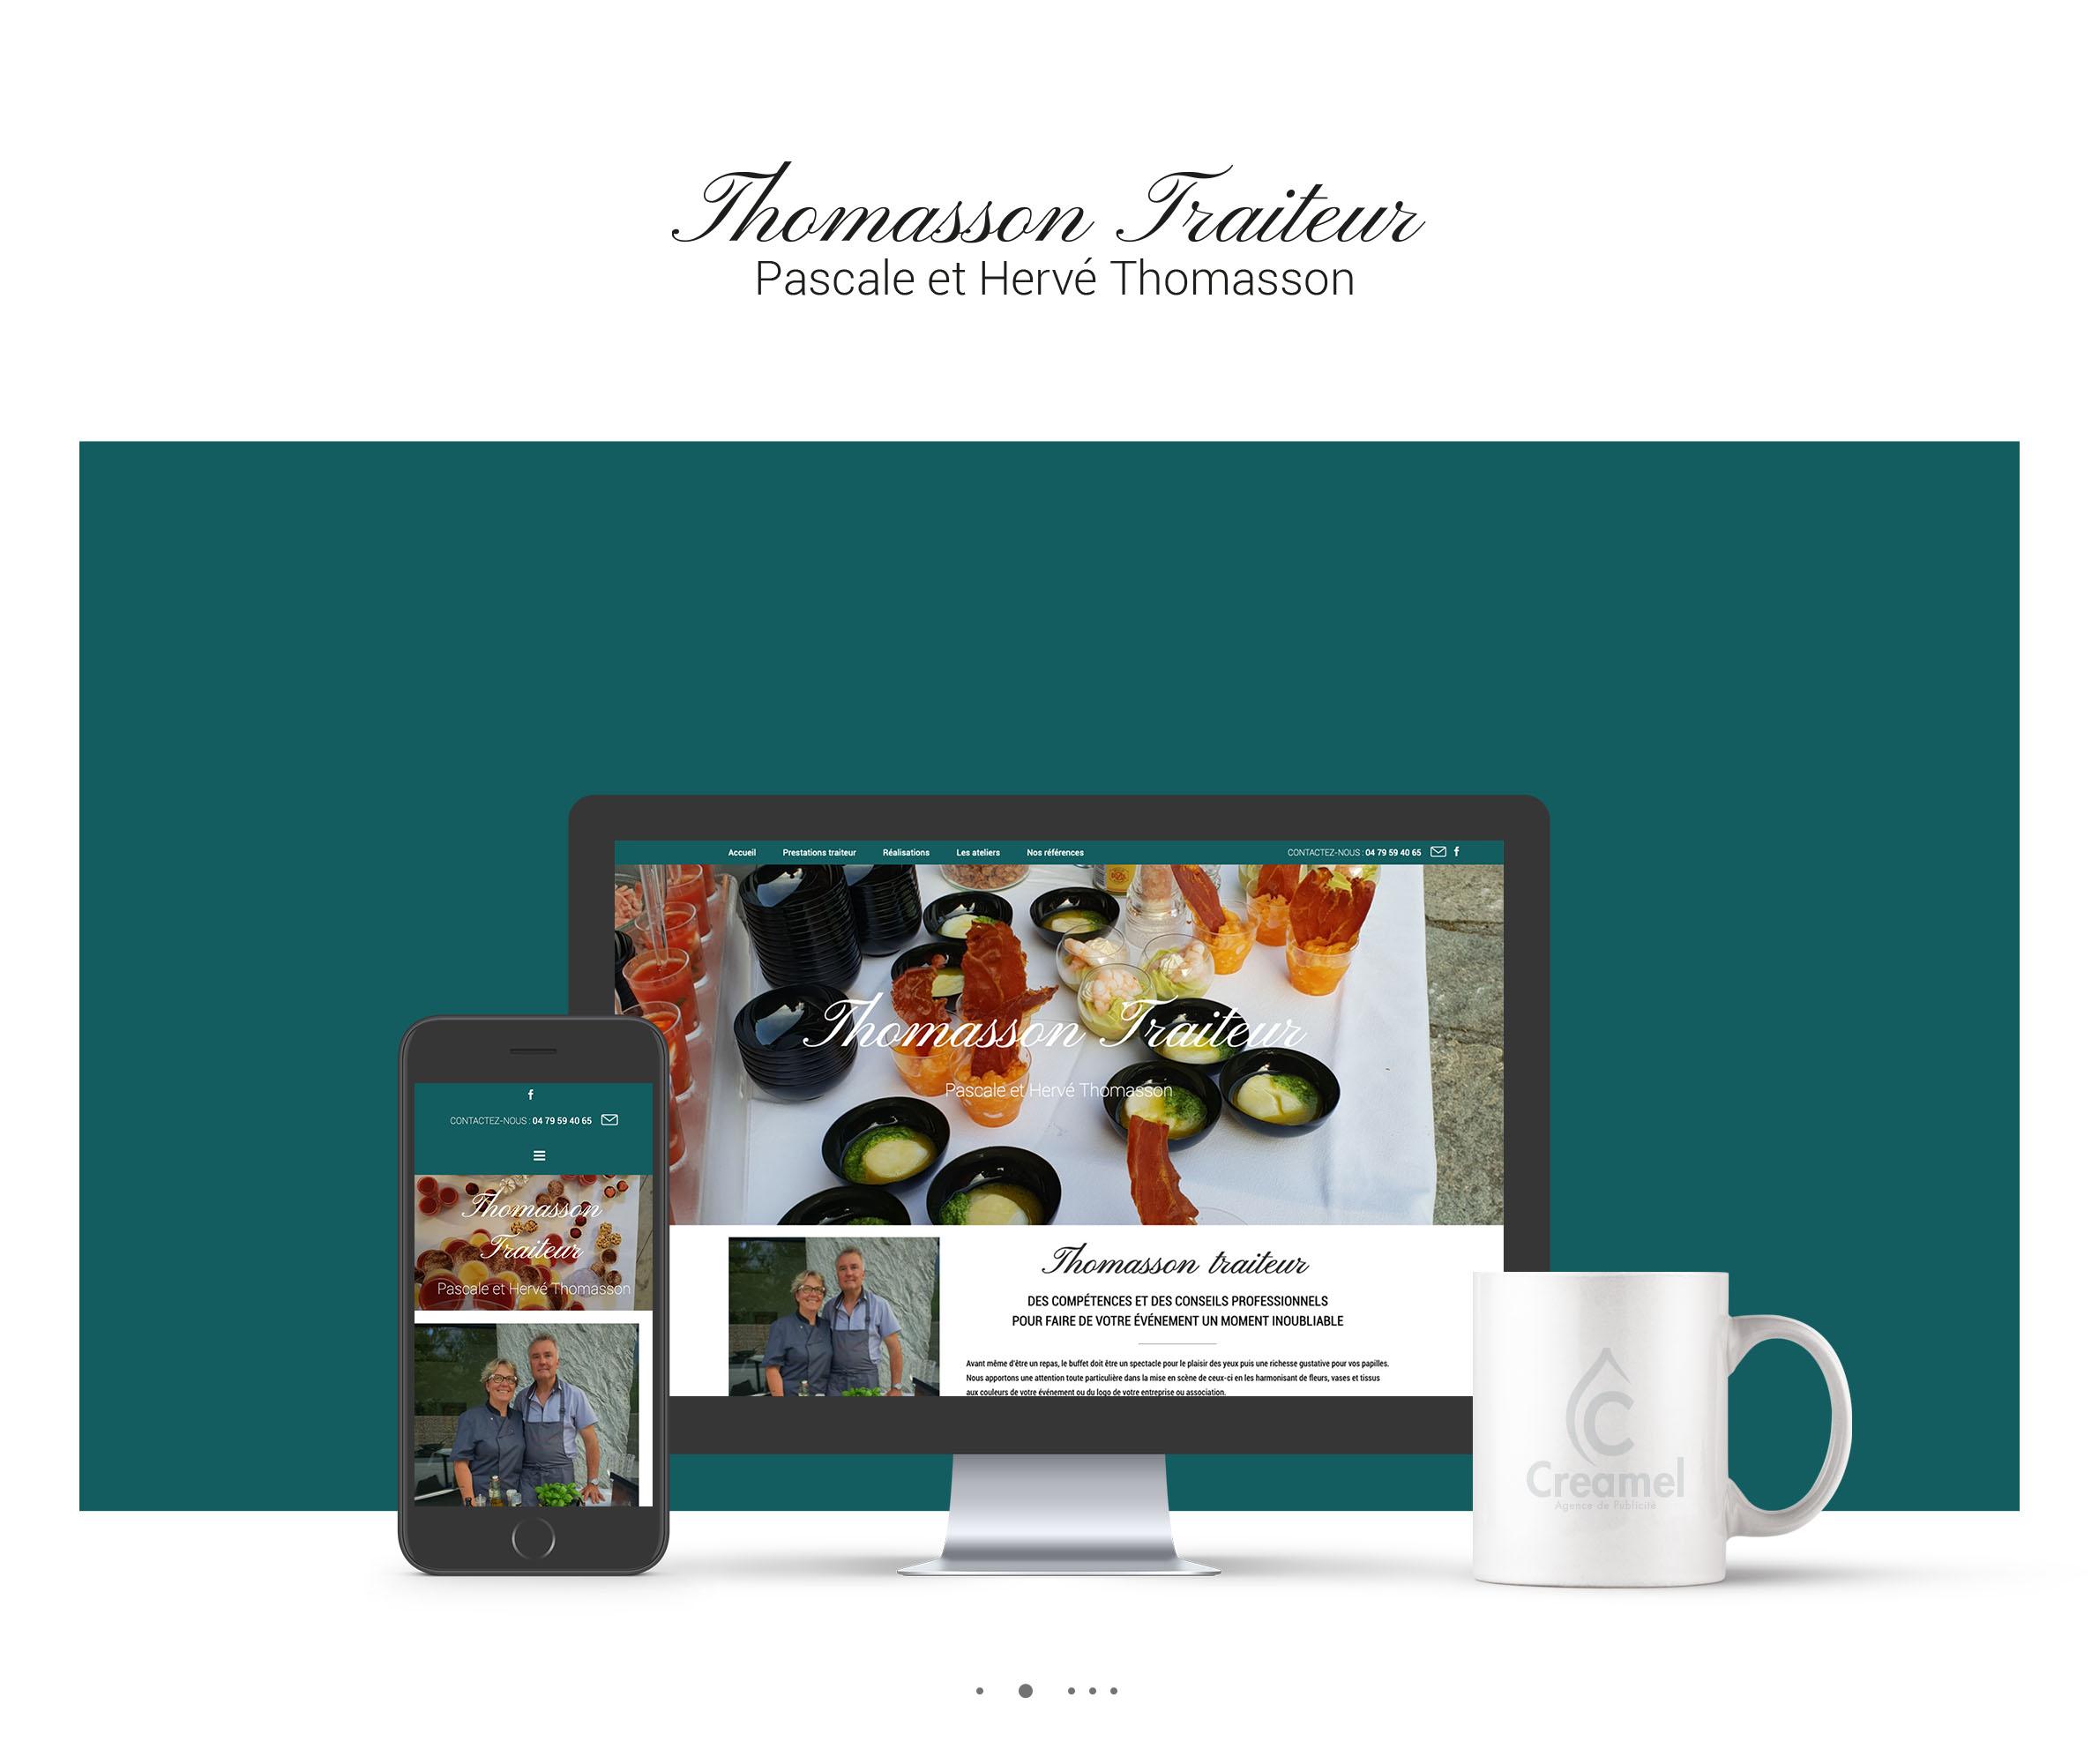 Thomasson Traiteur Webdesign